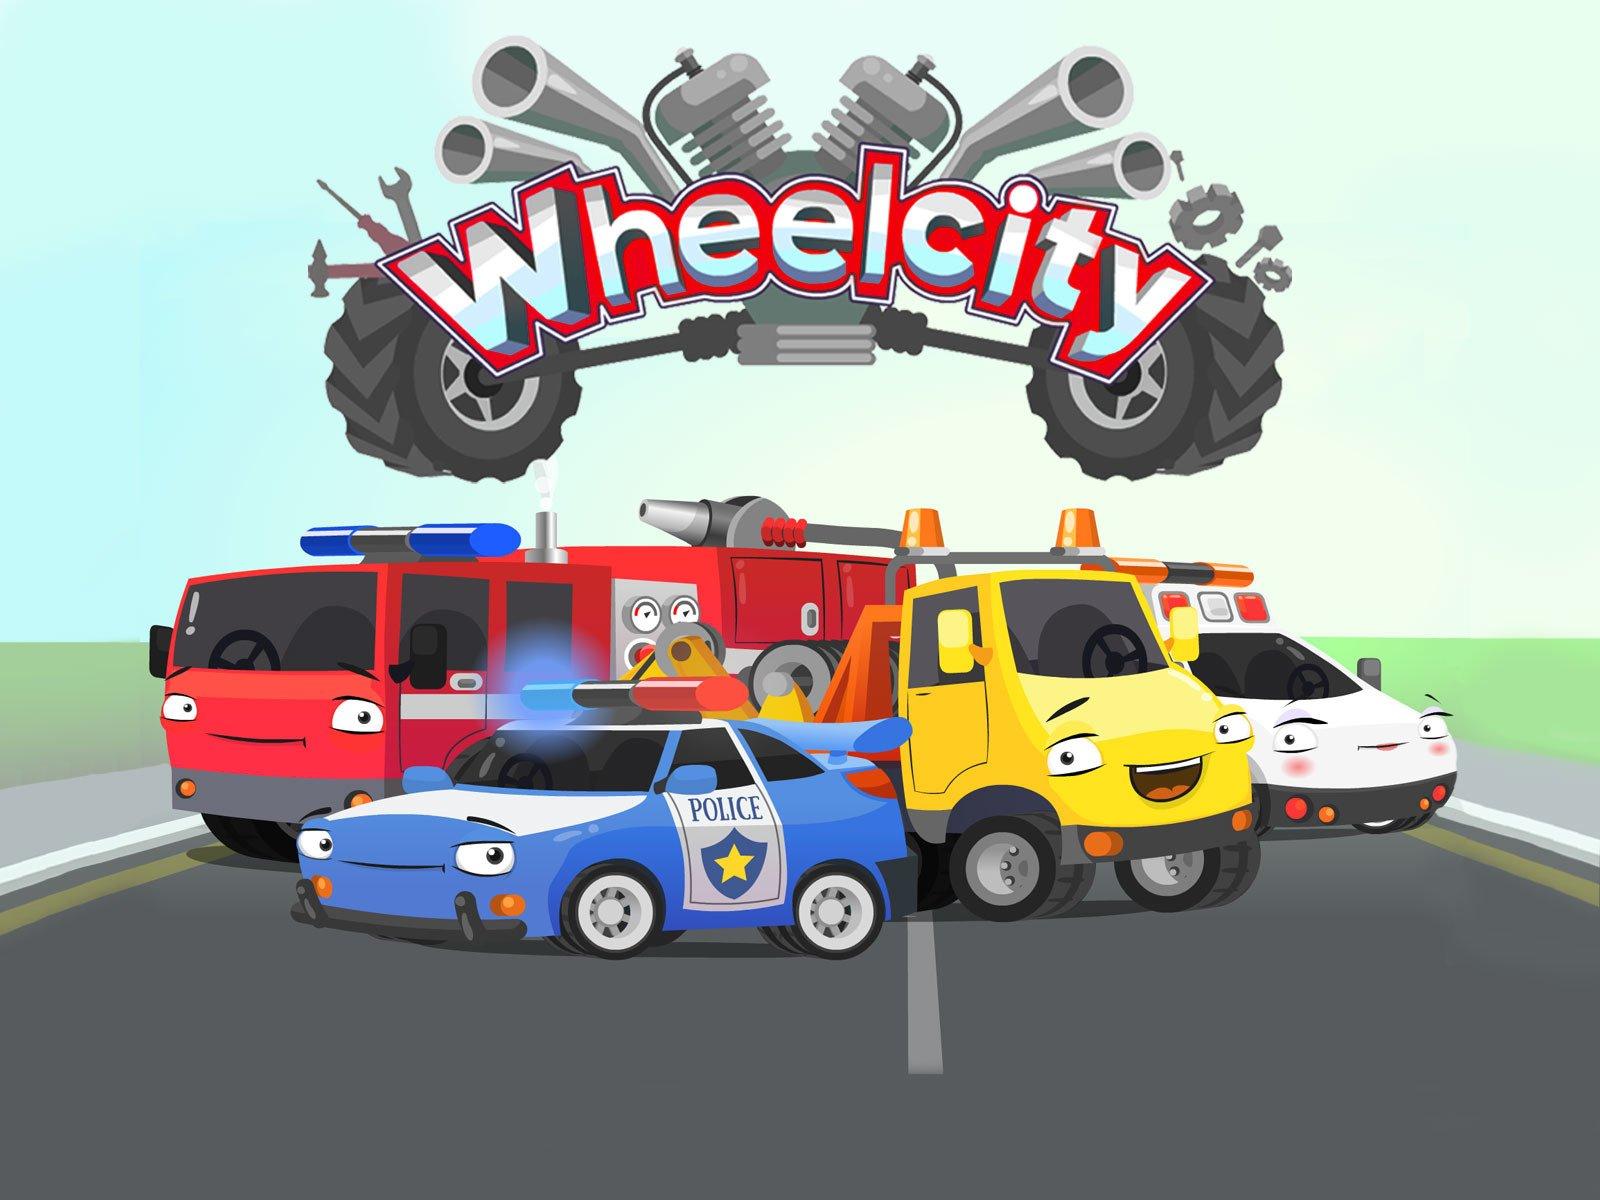 Wheelcity - Season 1